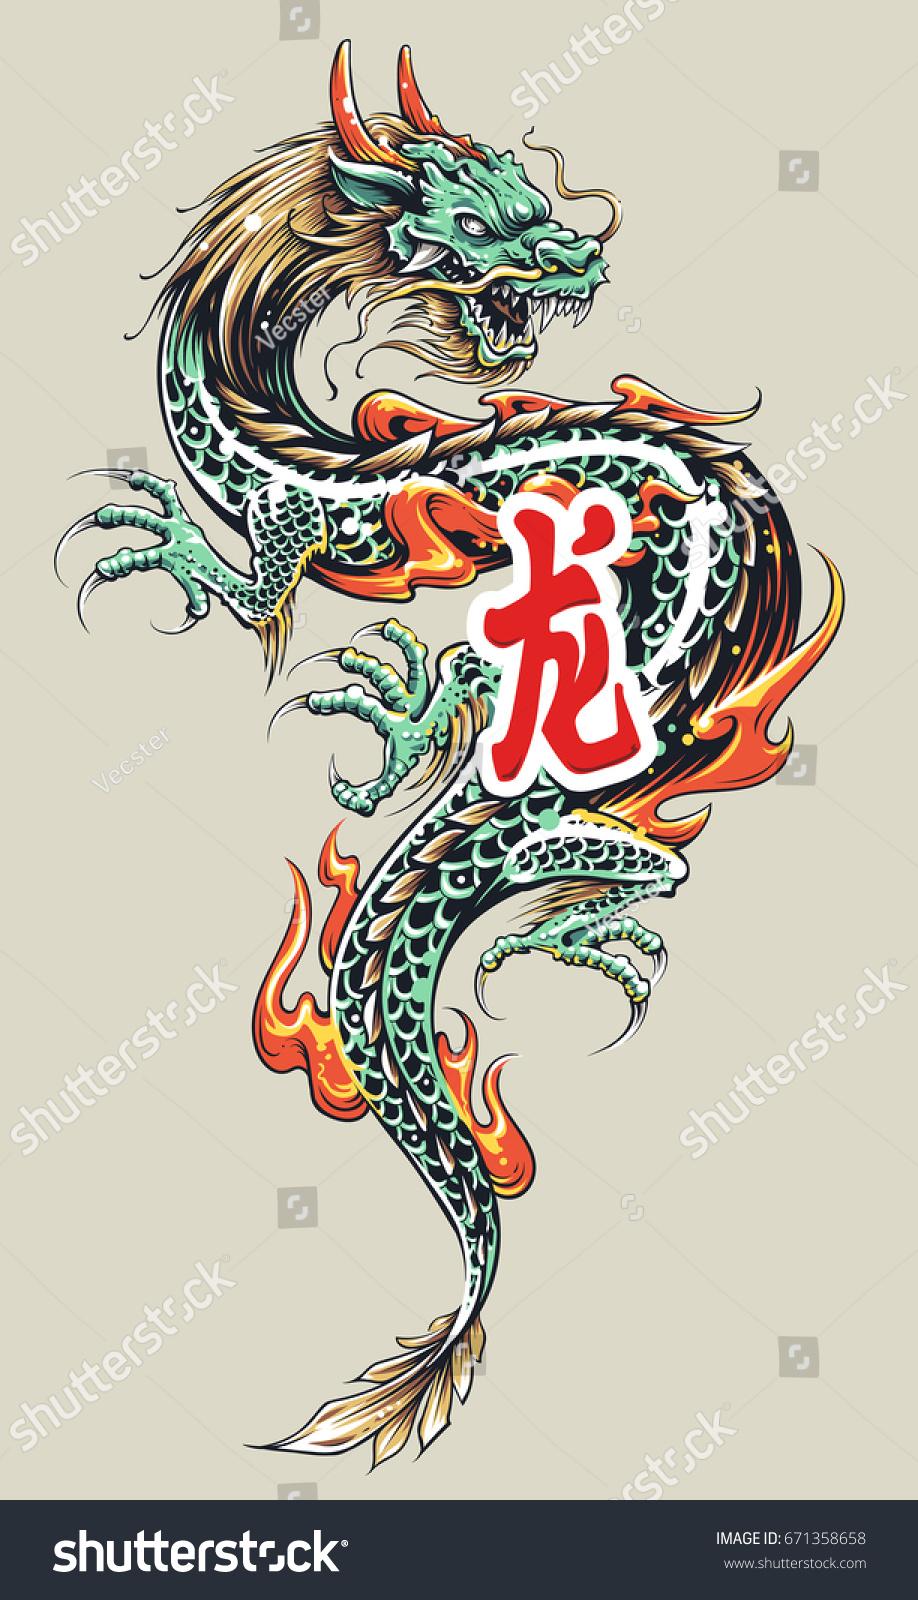 Asian Tattoos Illustrations: Color Asian Dragon Tattoo Illustration Dragon Stock Vector